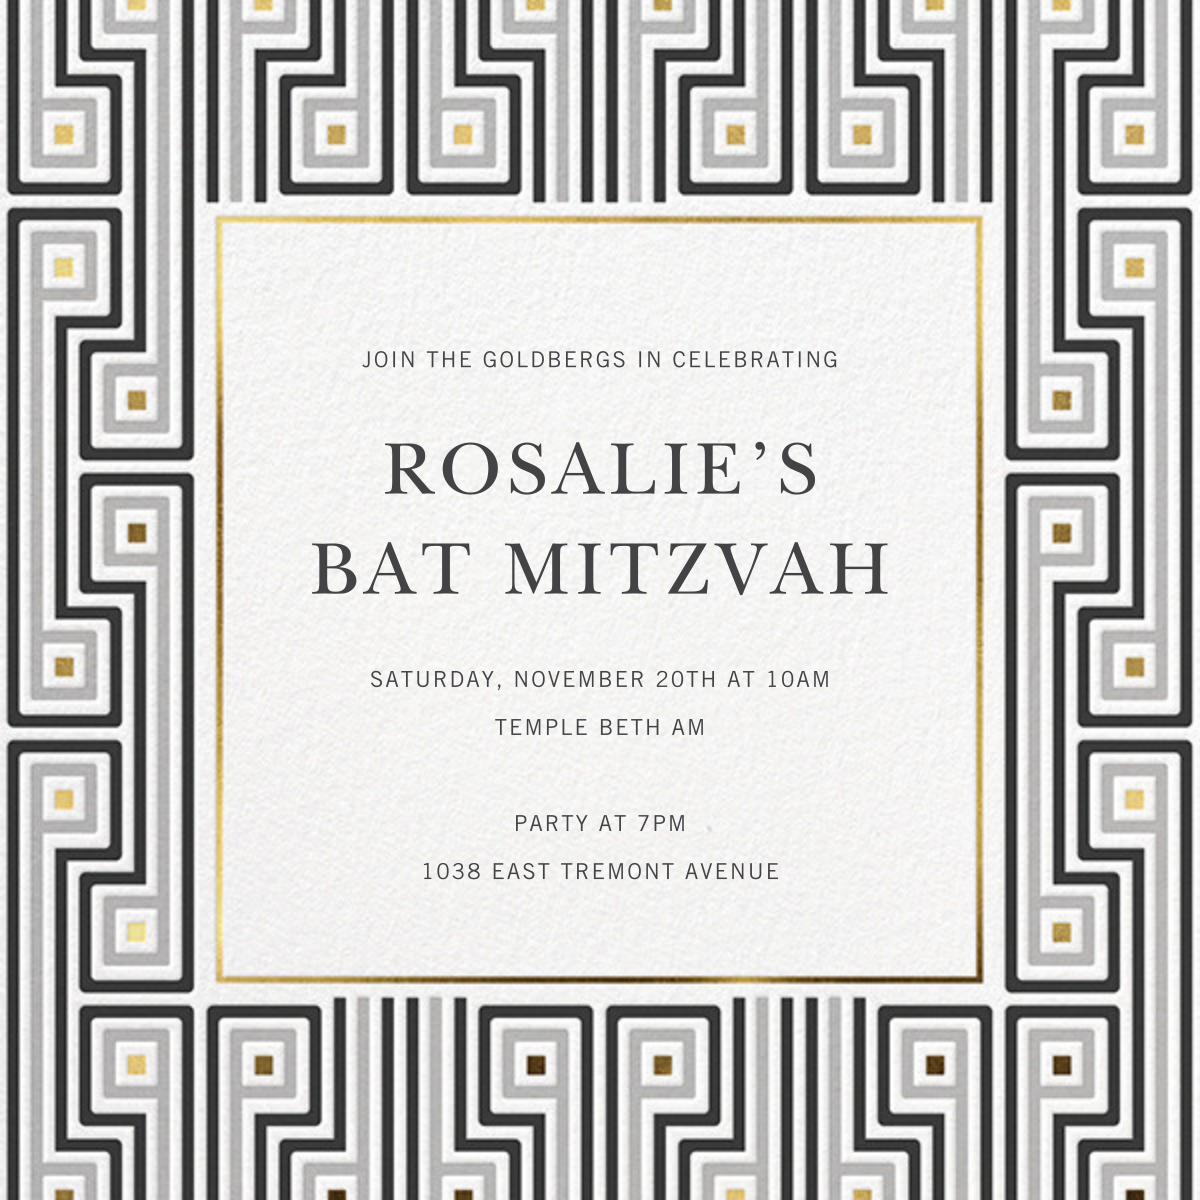 Miramar - Jonathan Adler - Bar and bat mitzvah